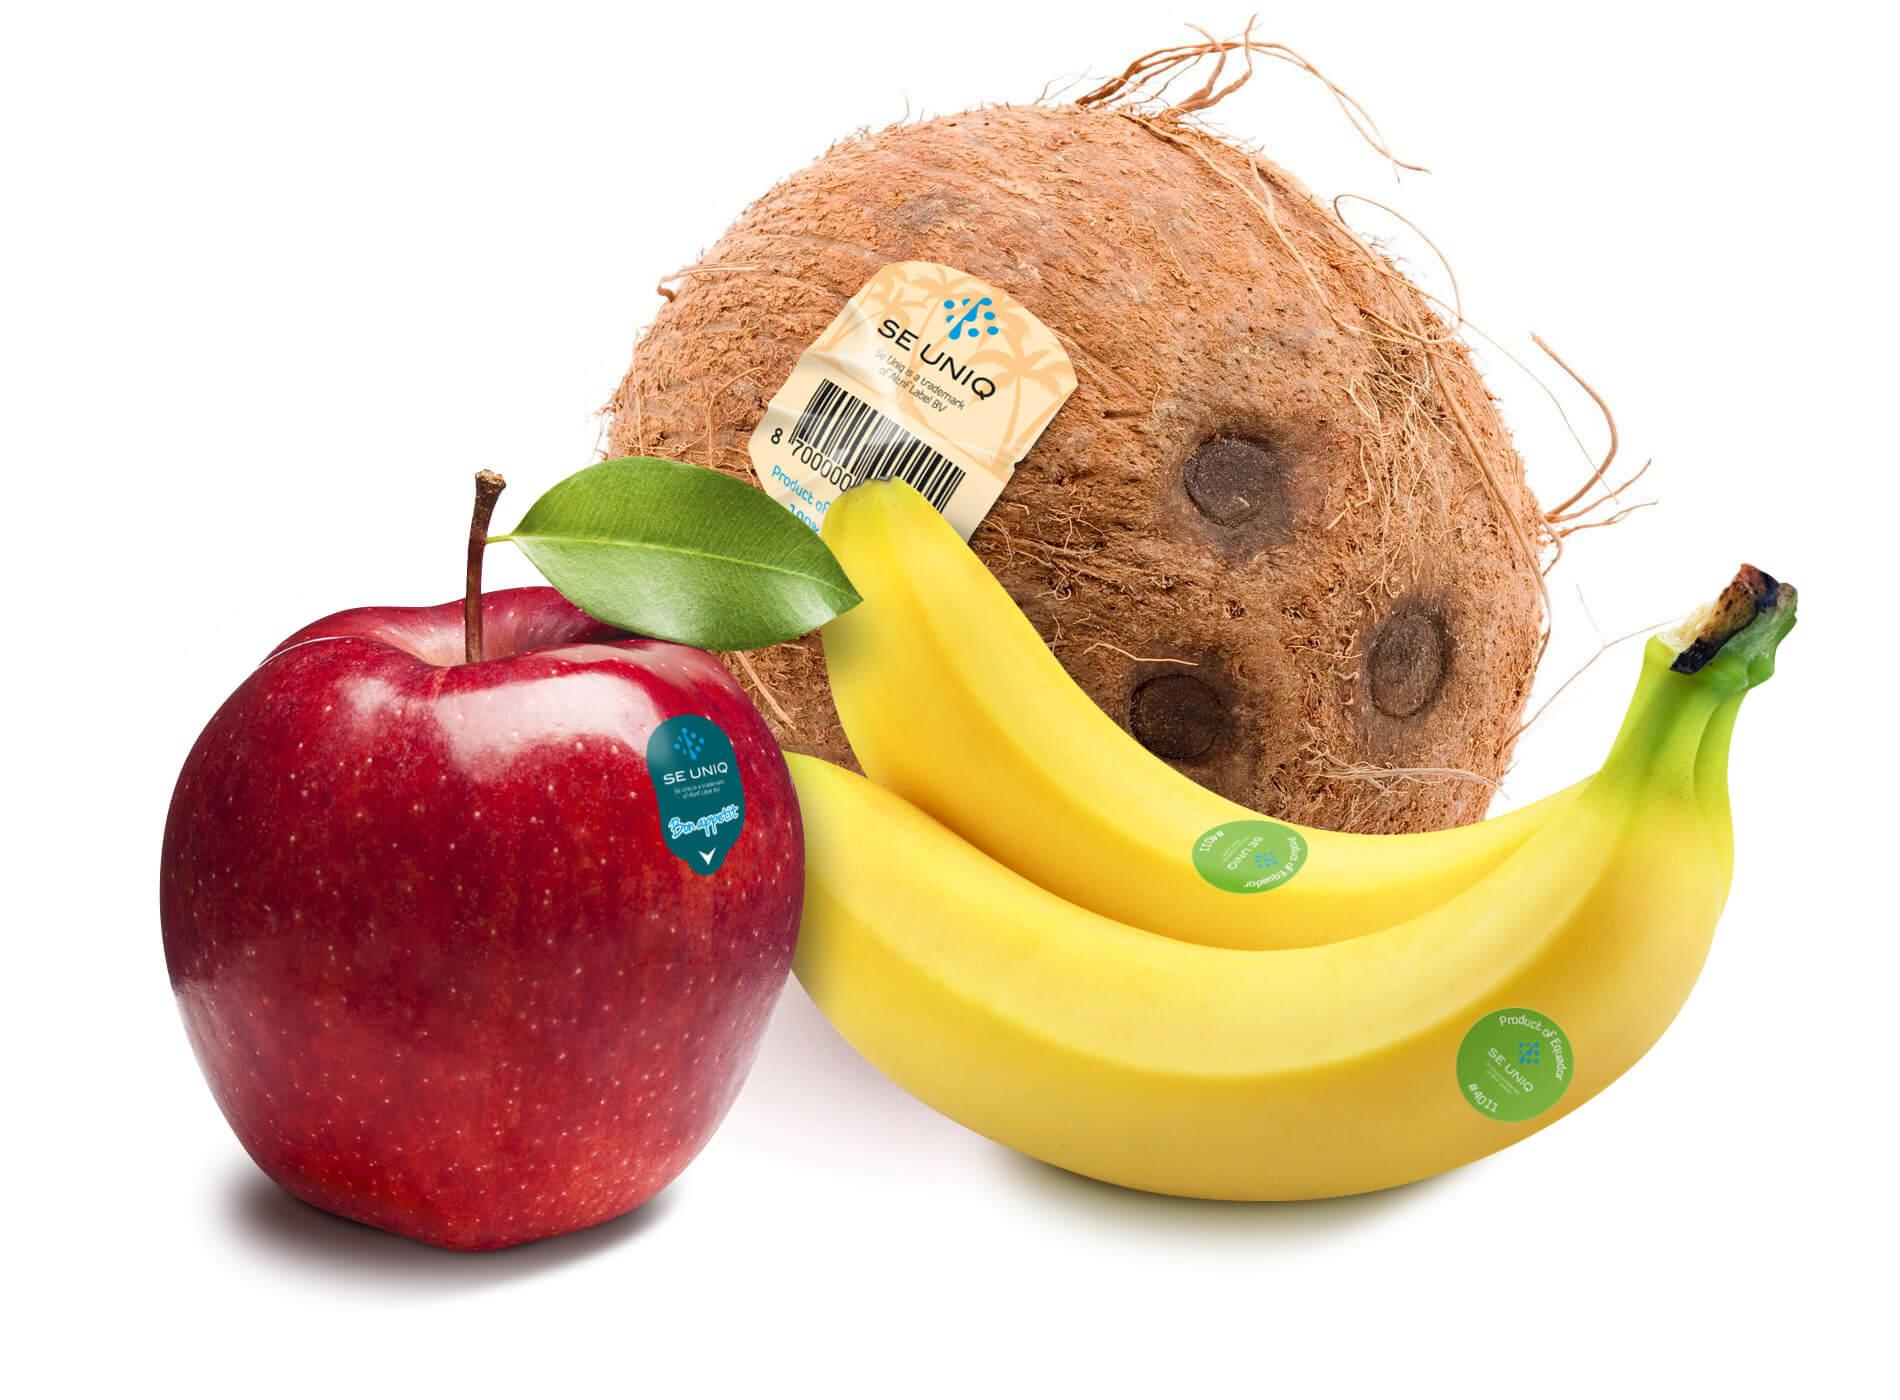 fruitmix-fruitetiketten.jpg